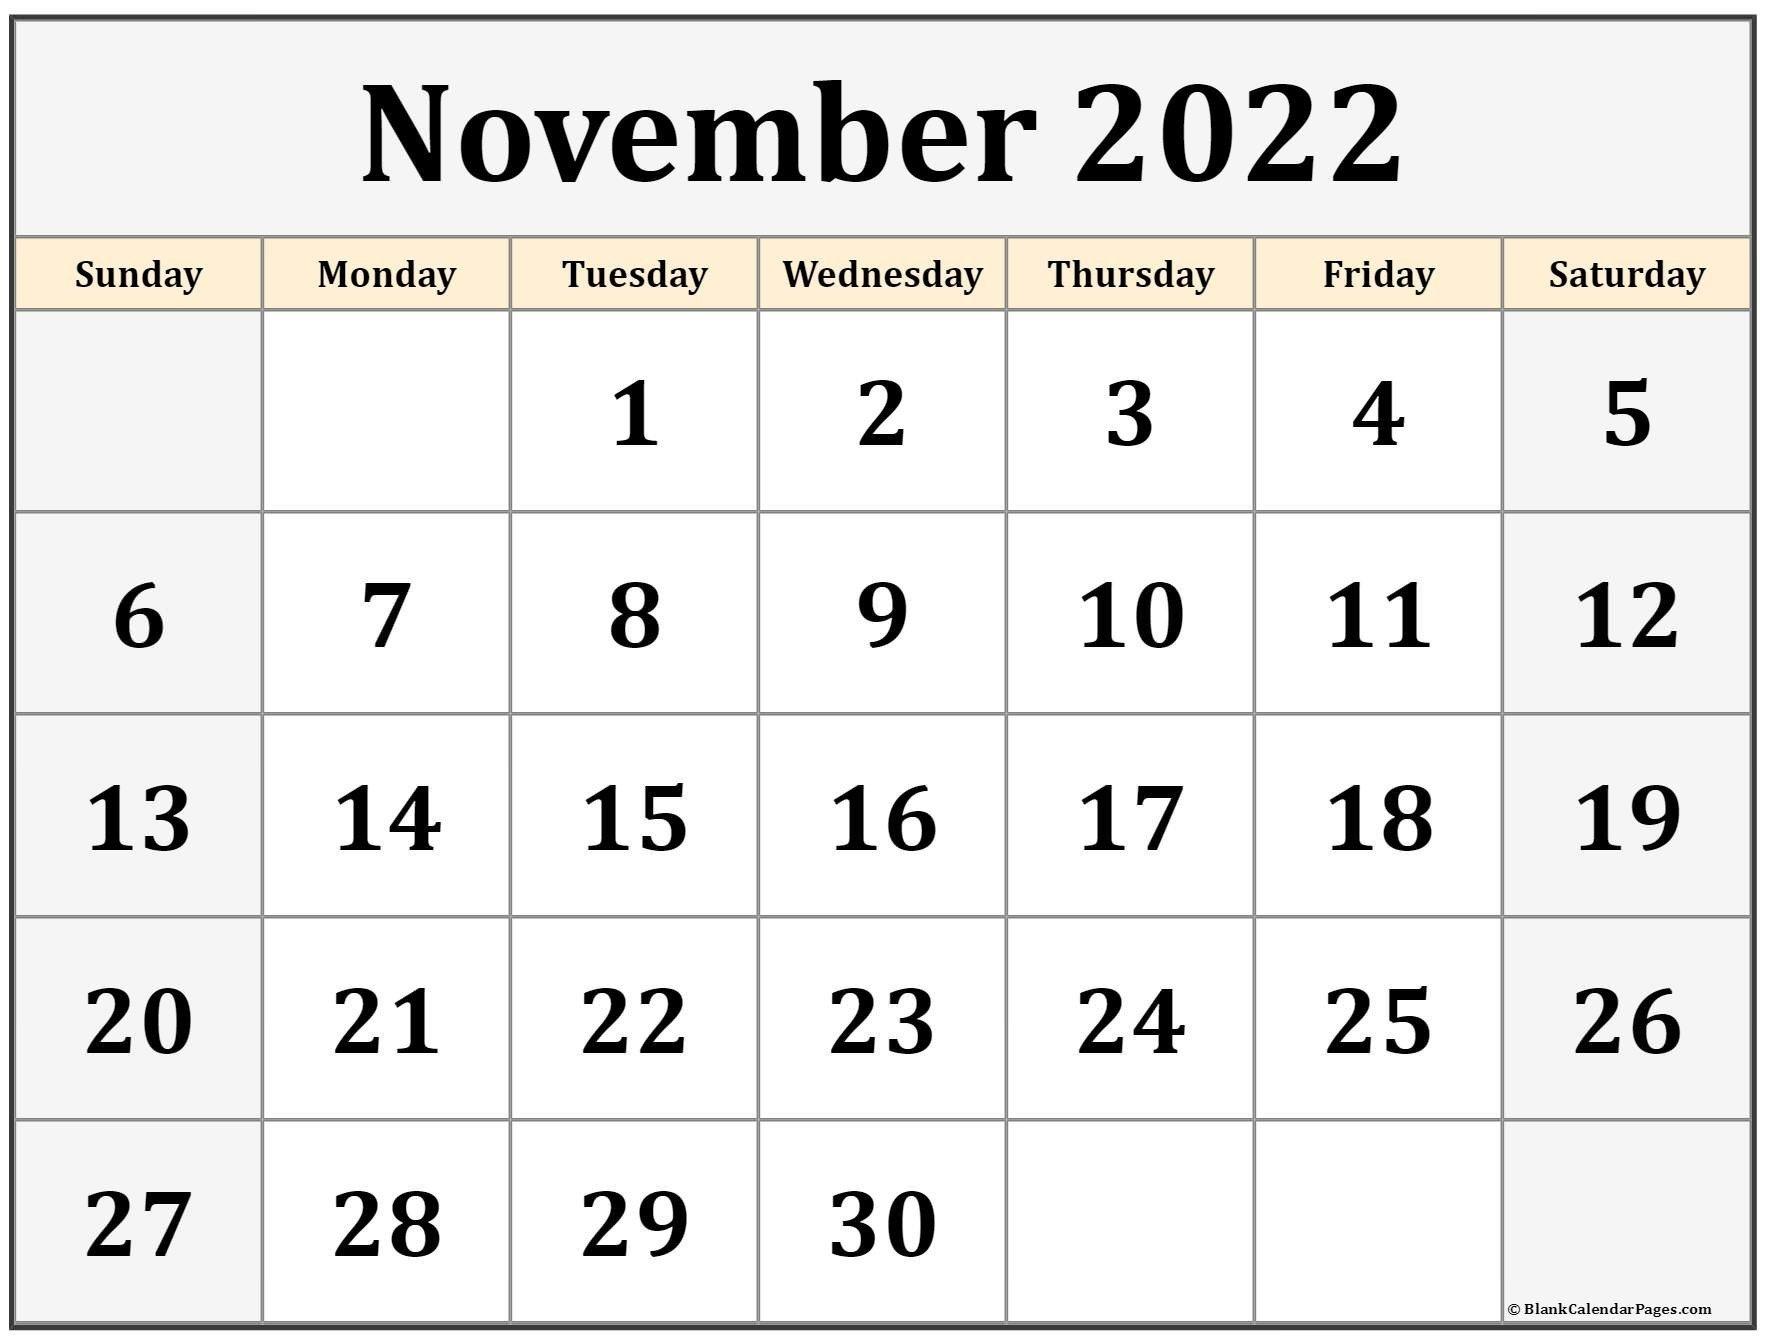 November 2022 Calendar Printable | Free Printable Calendar with regard to November 2022 Calendar Planner Printable